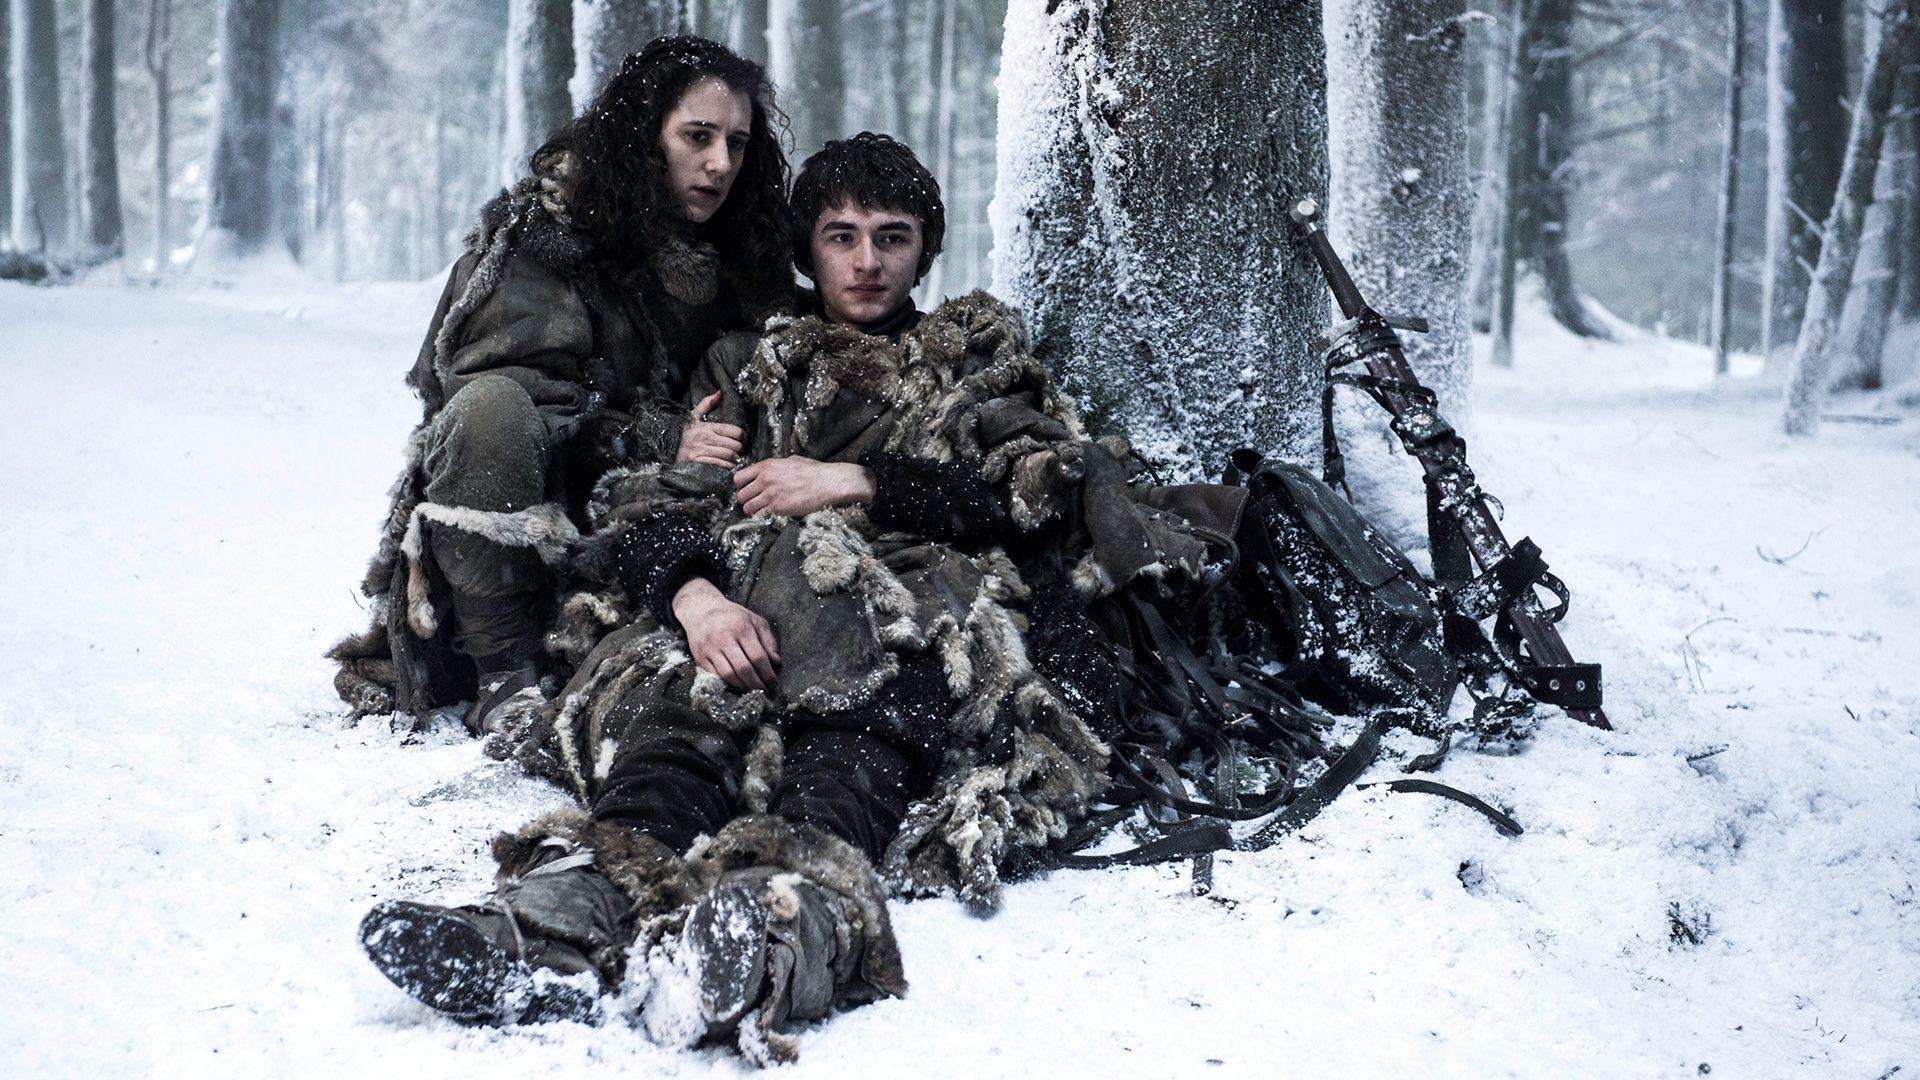 Game Of Thrones Season 6 Reddit User Reveals Major Spoilers Never